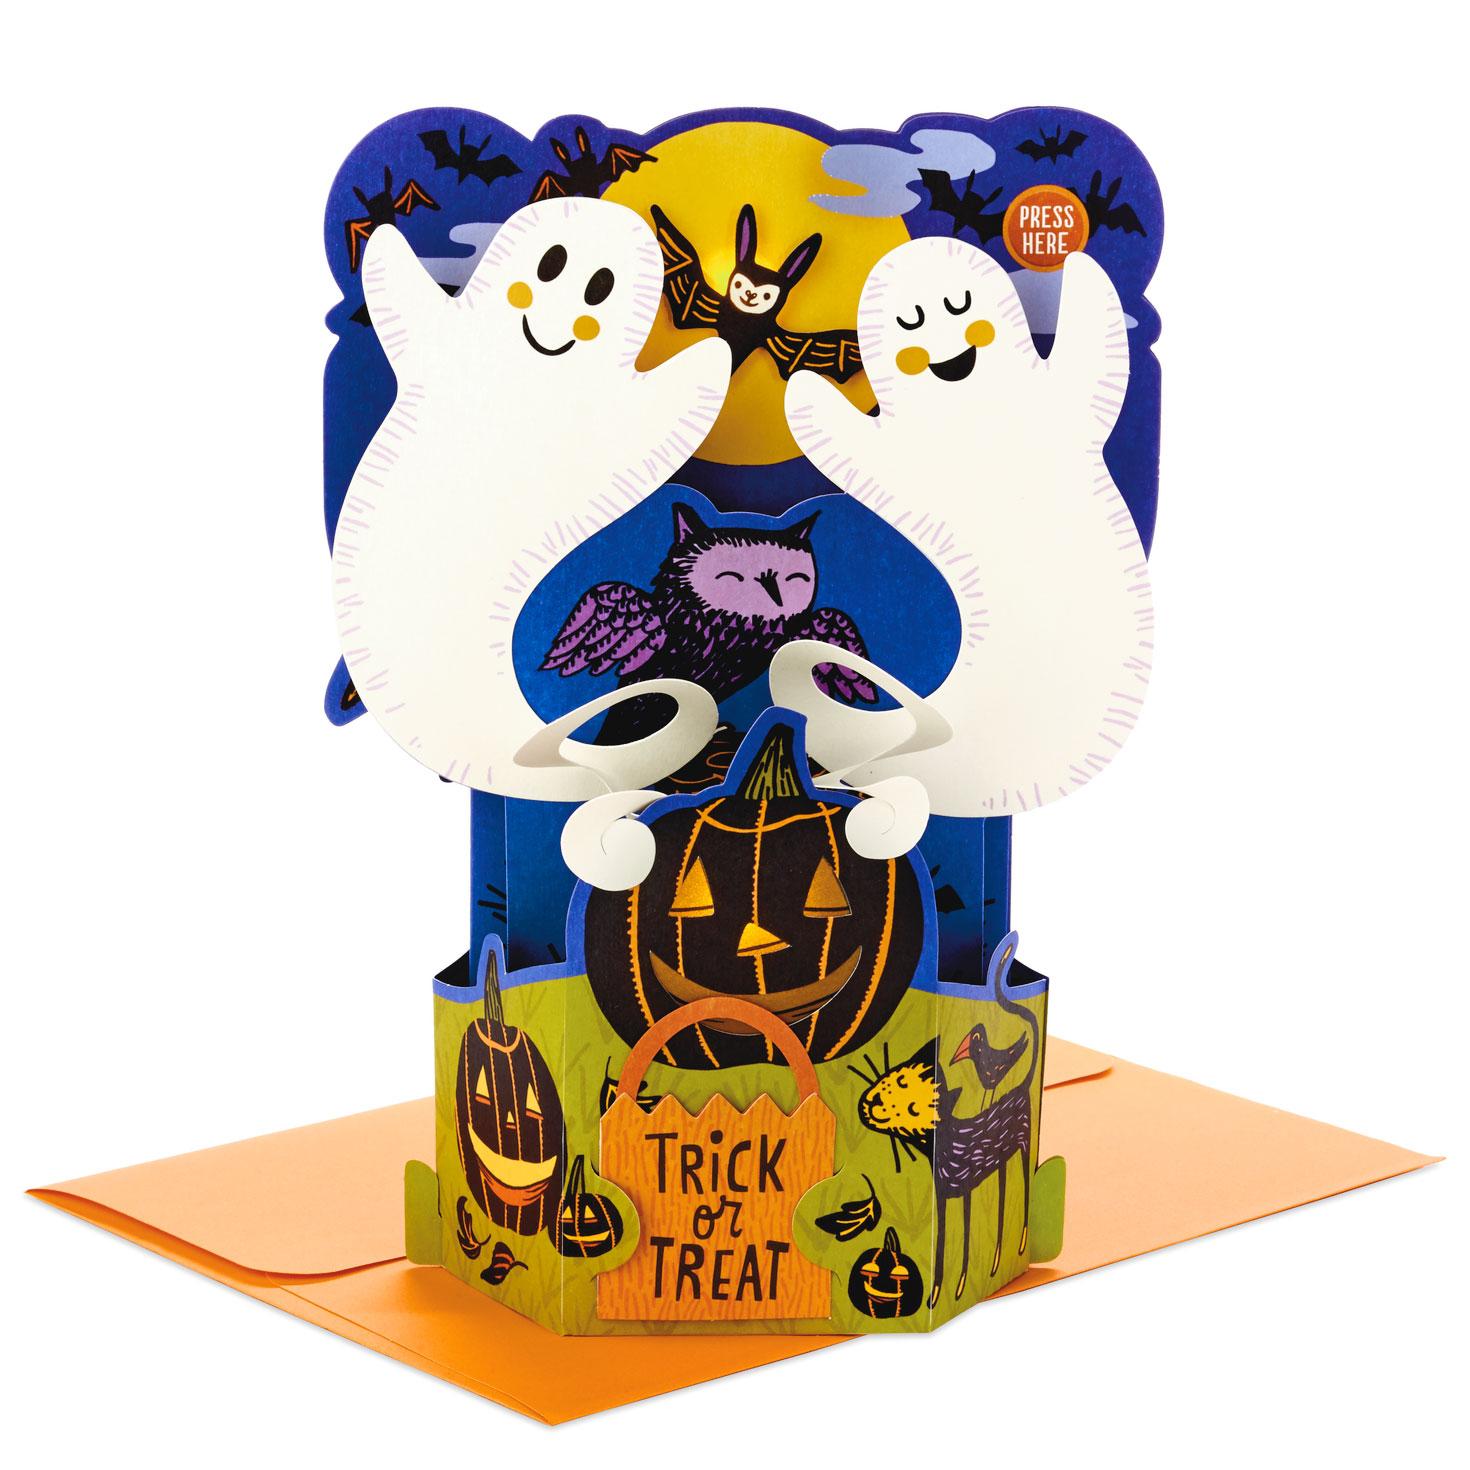 Halloween Pop.Spooky Scene 3d Pop Up Musical Halloween Card With Light